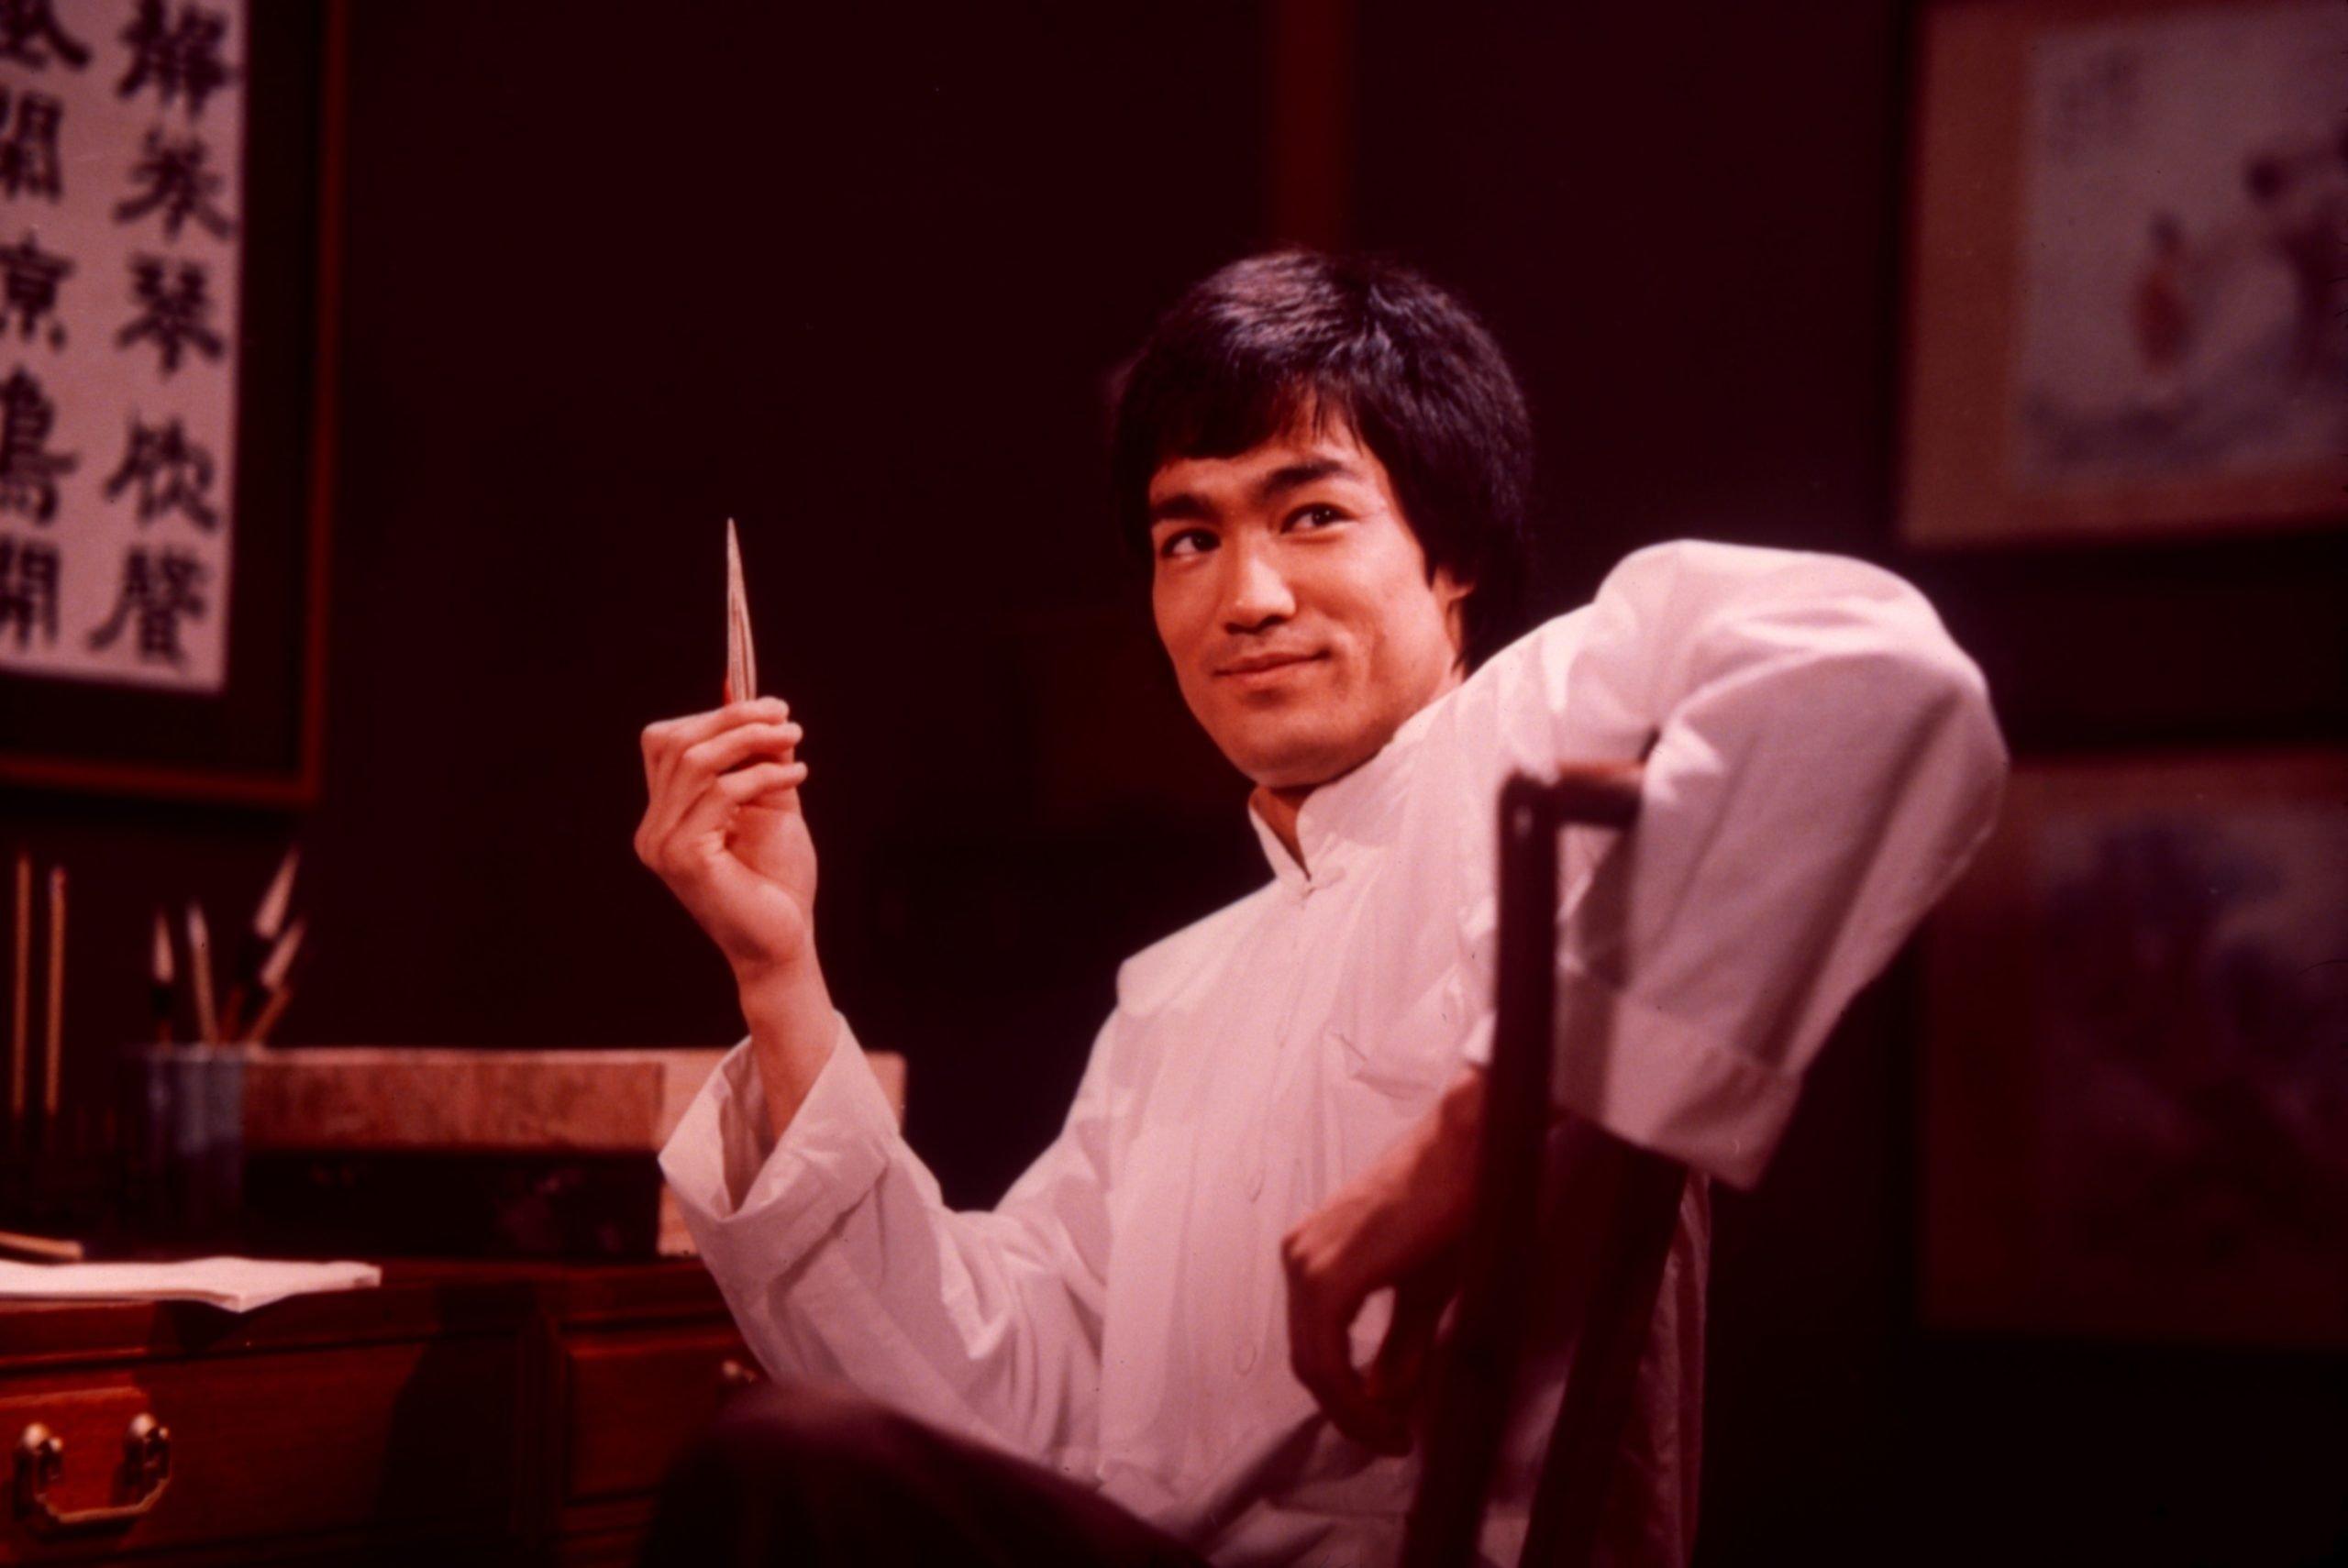 Bruce Lee's Enter the Dragon helped fuel a martial arts movie craze